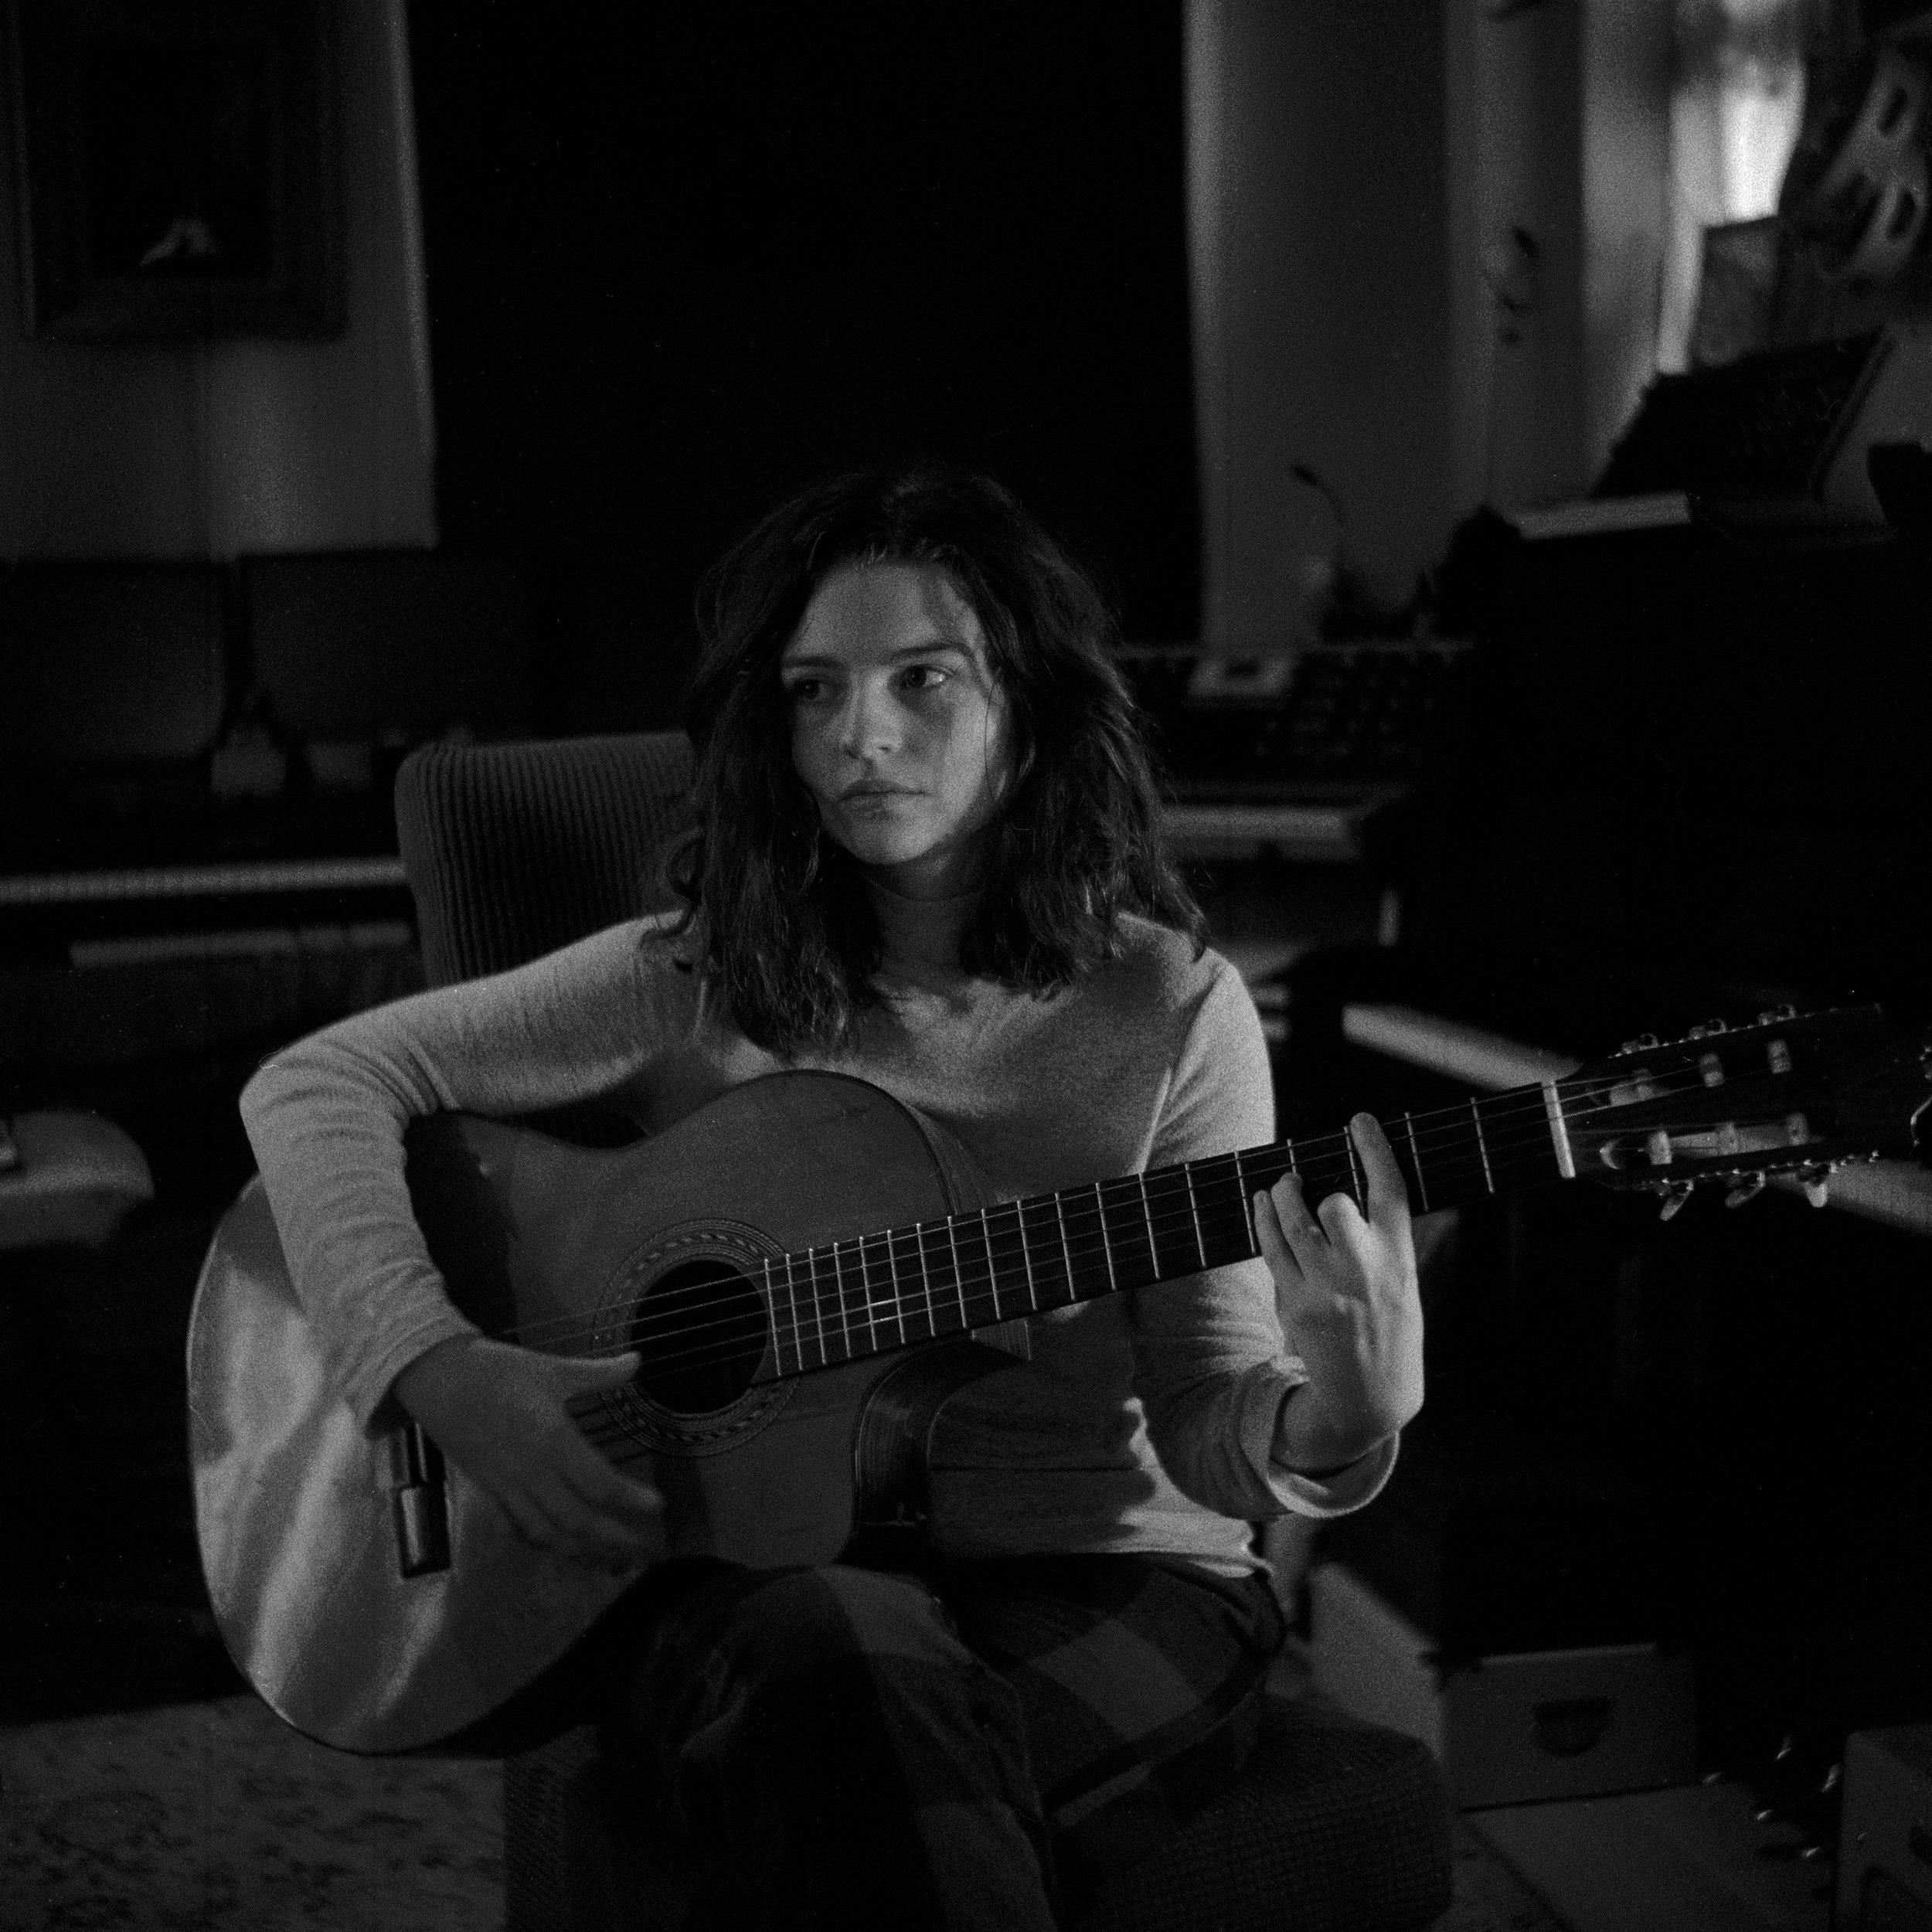 Saoirse Casey - Black & White - 120 Film - Lubitel 2